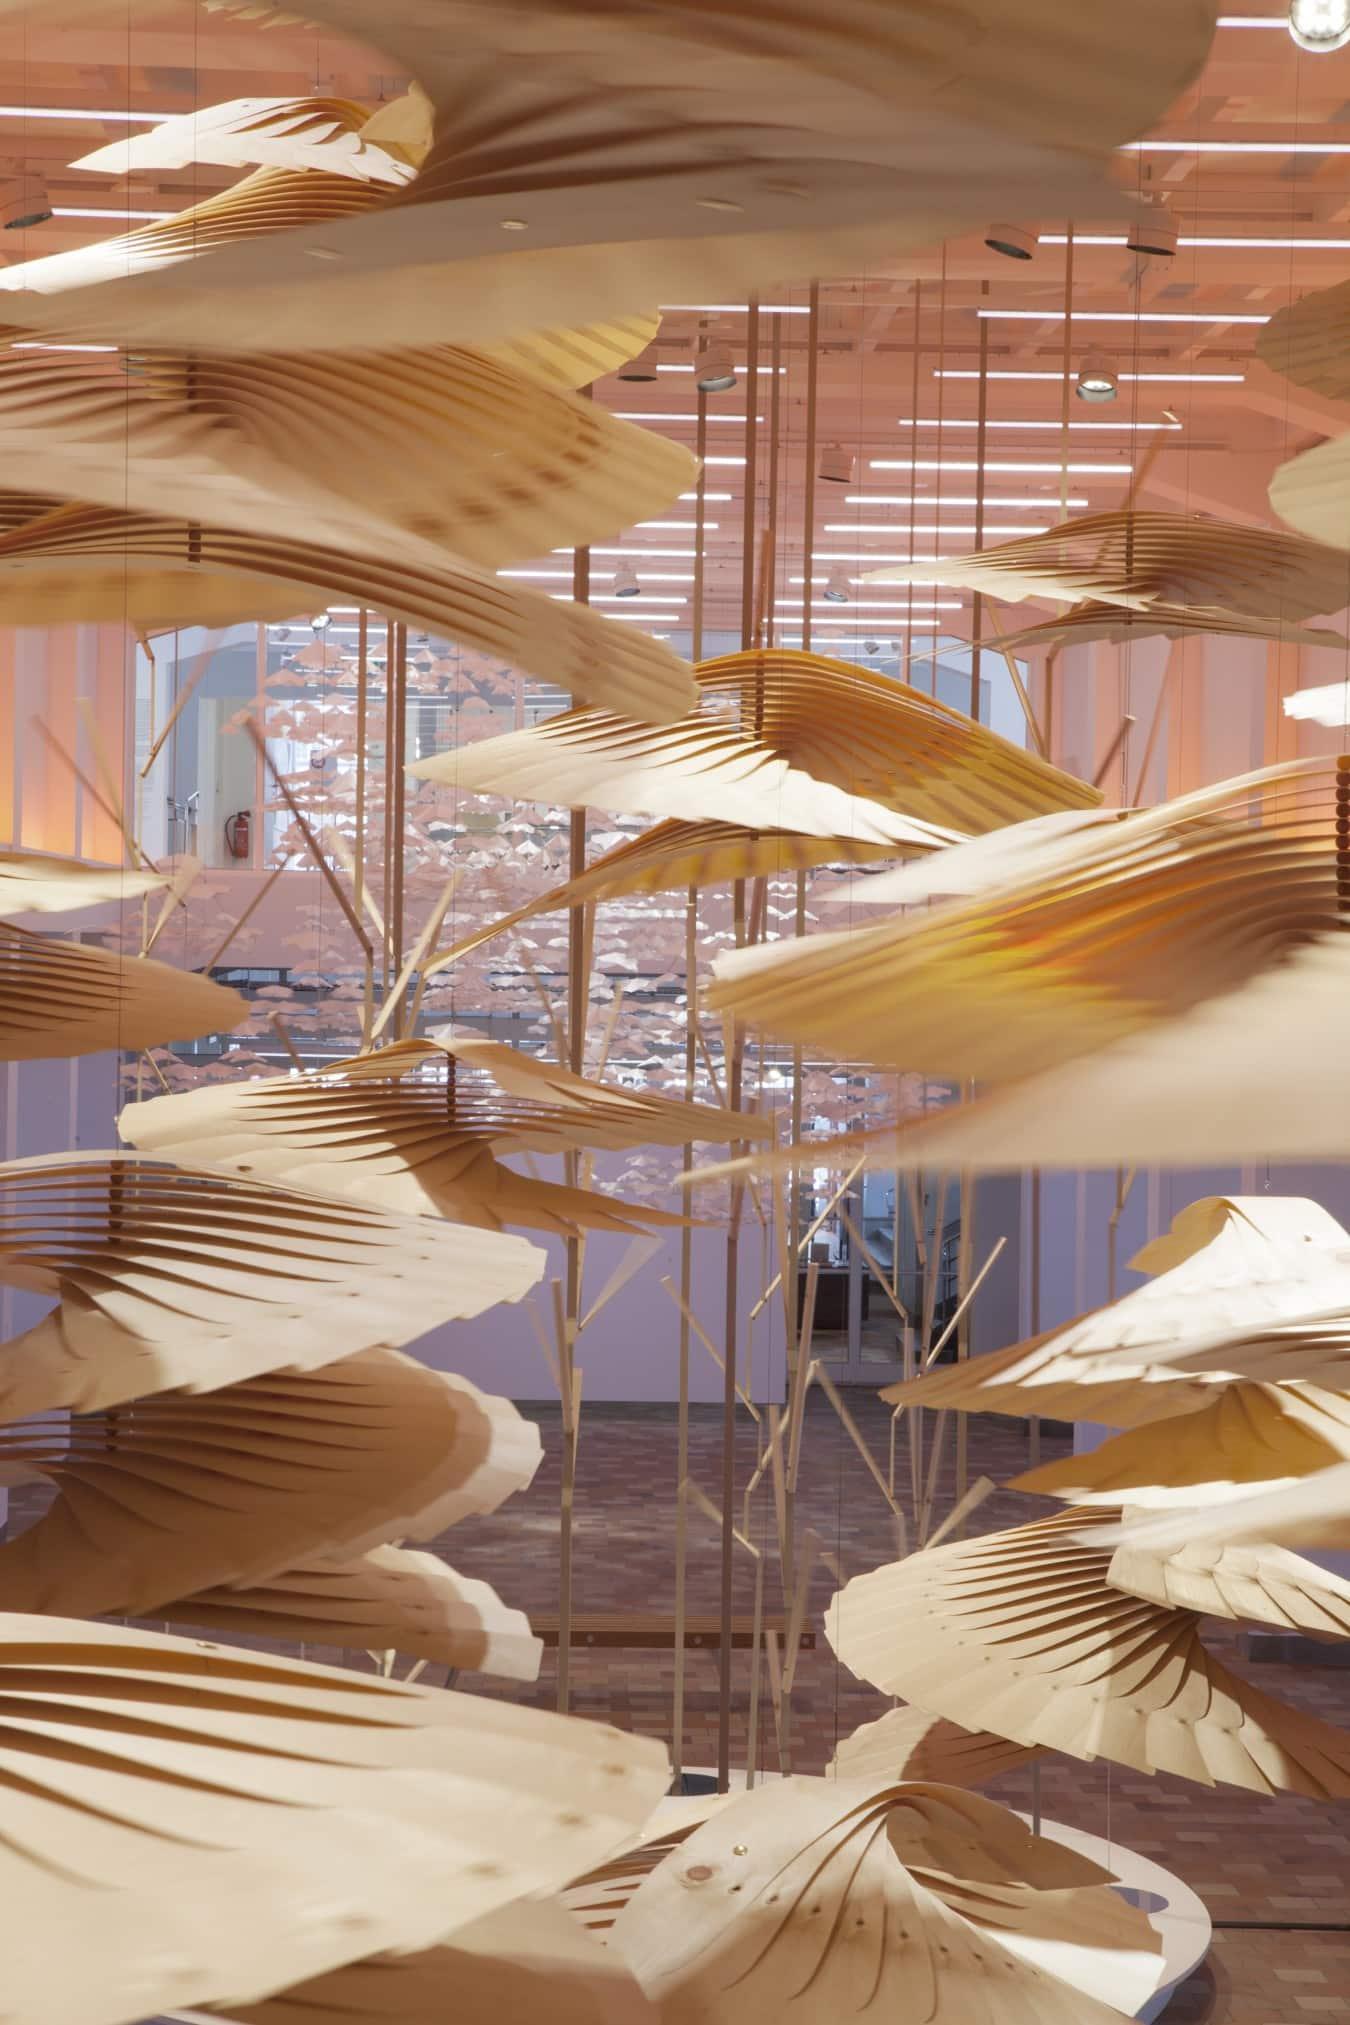 BOOMSPDESIGN ATELIEROI 02 - São Paulo recebe o 7º Design Weekend